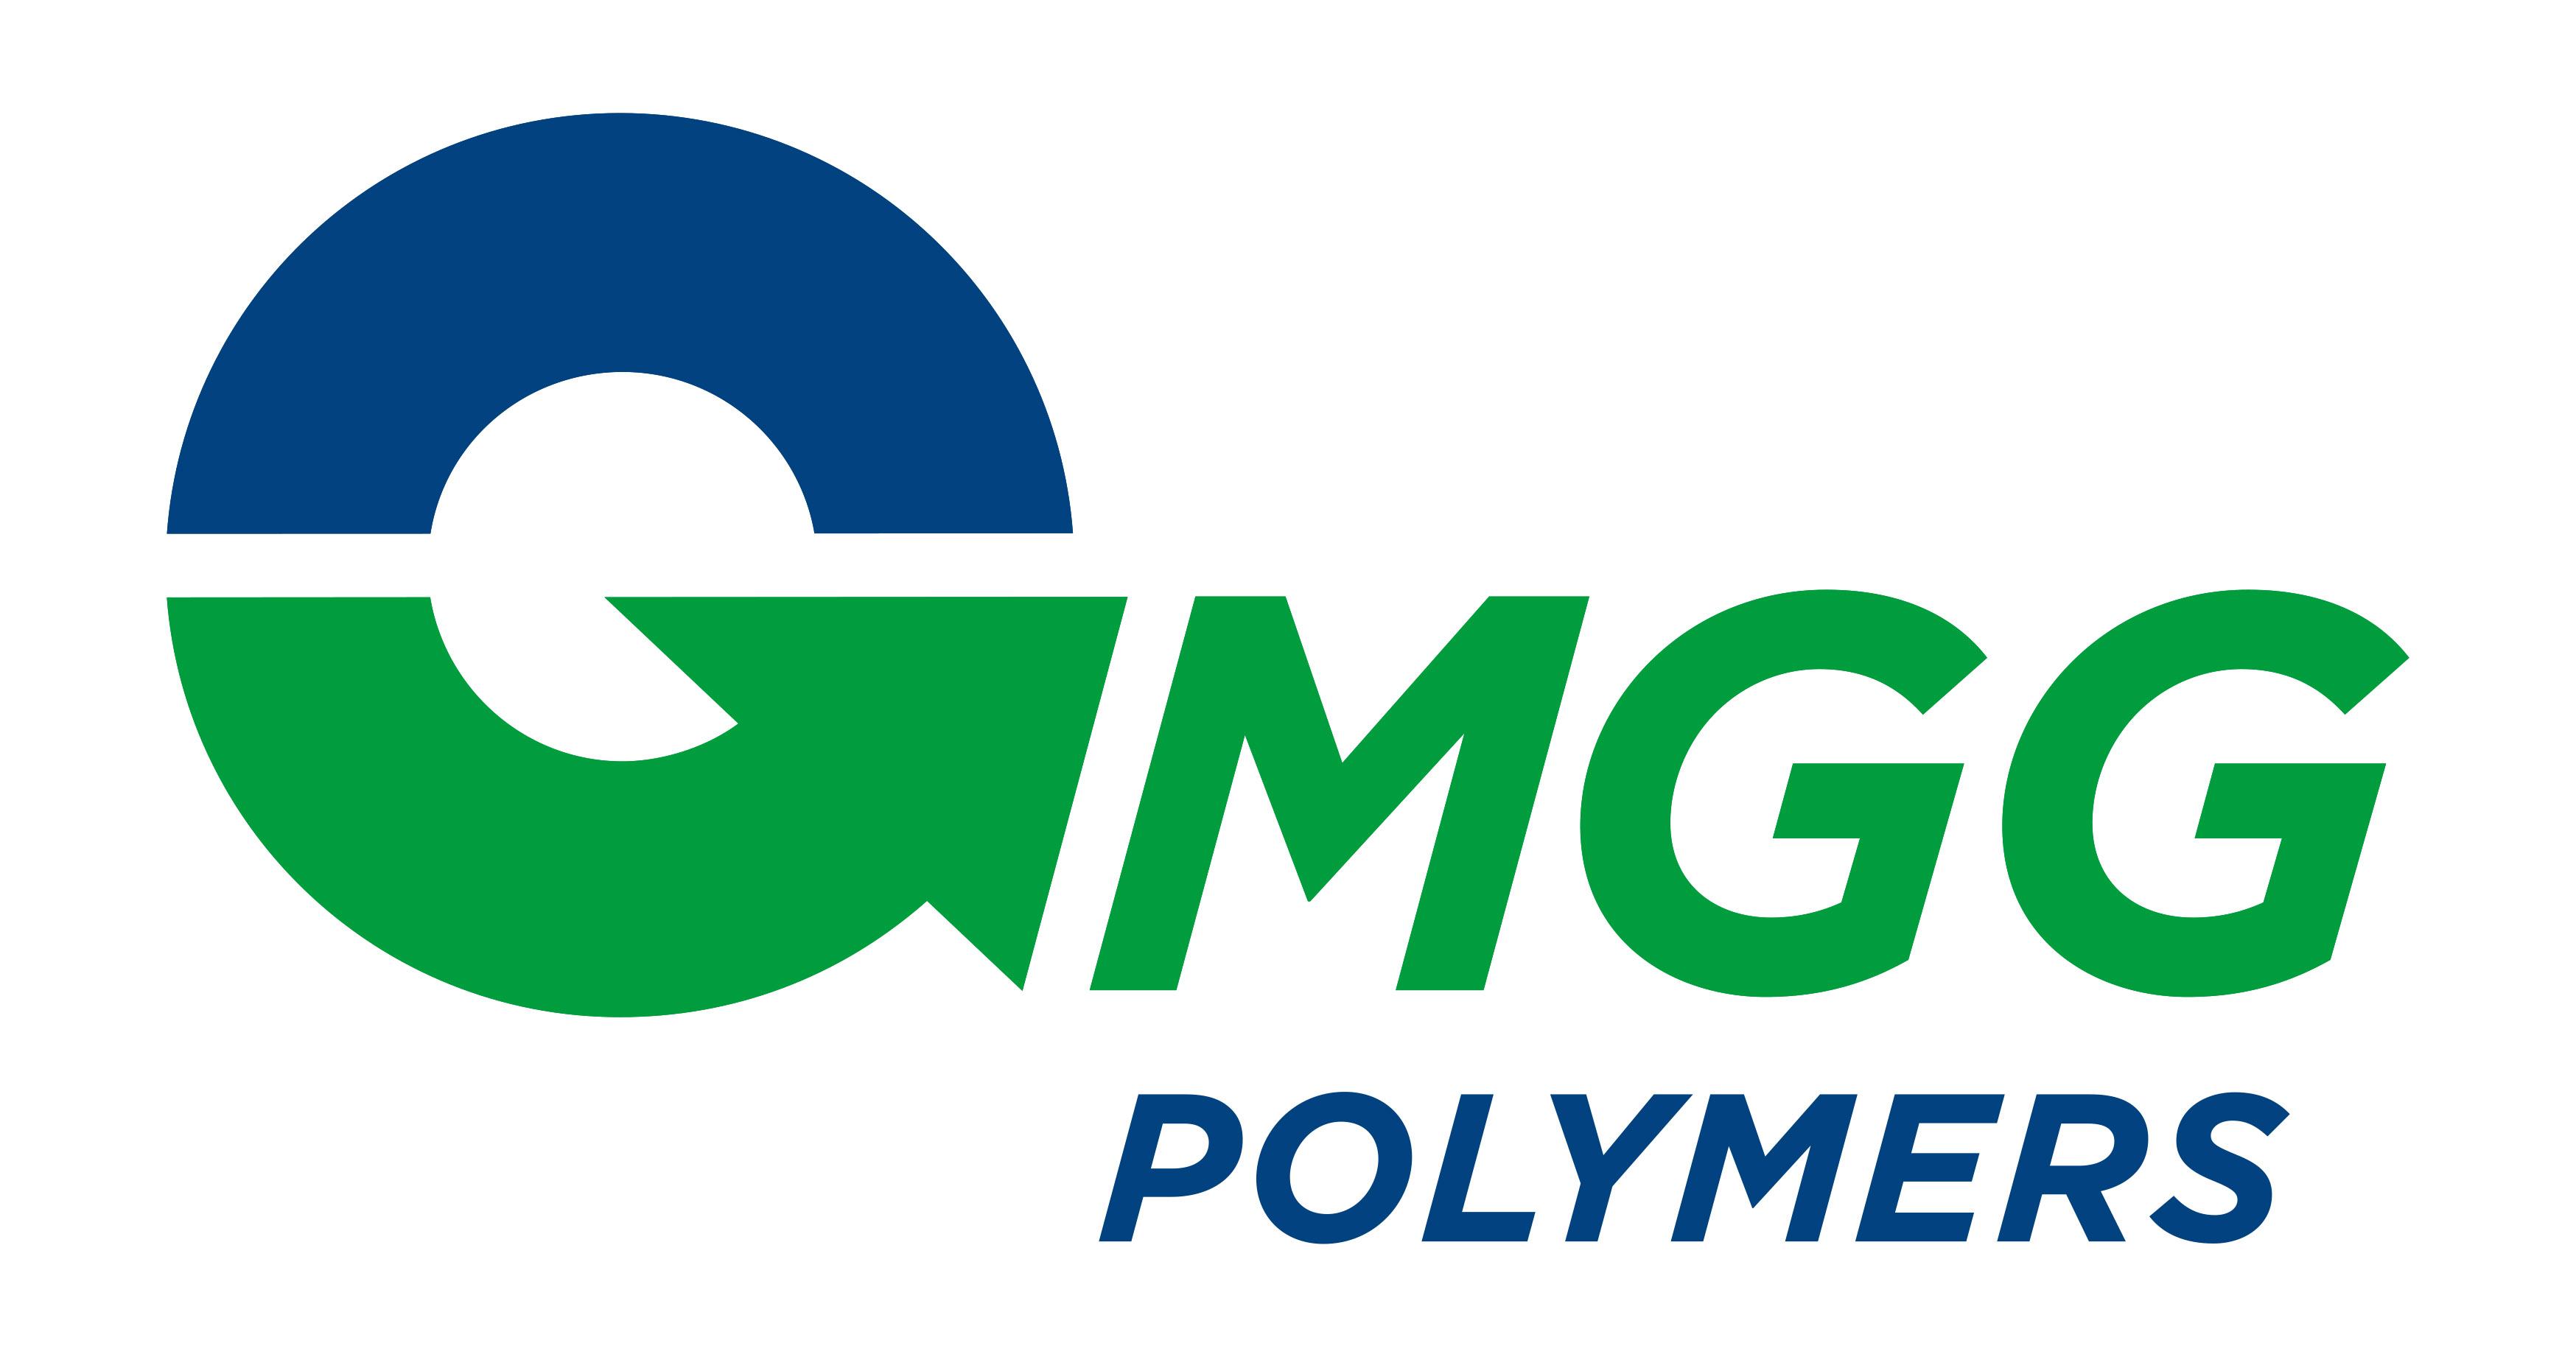 MGG Polymers GmbH